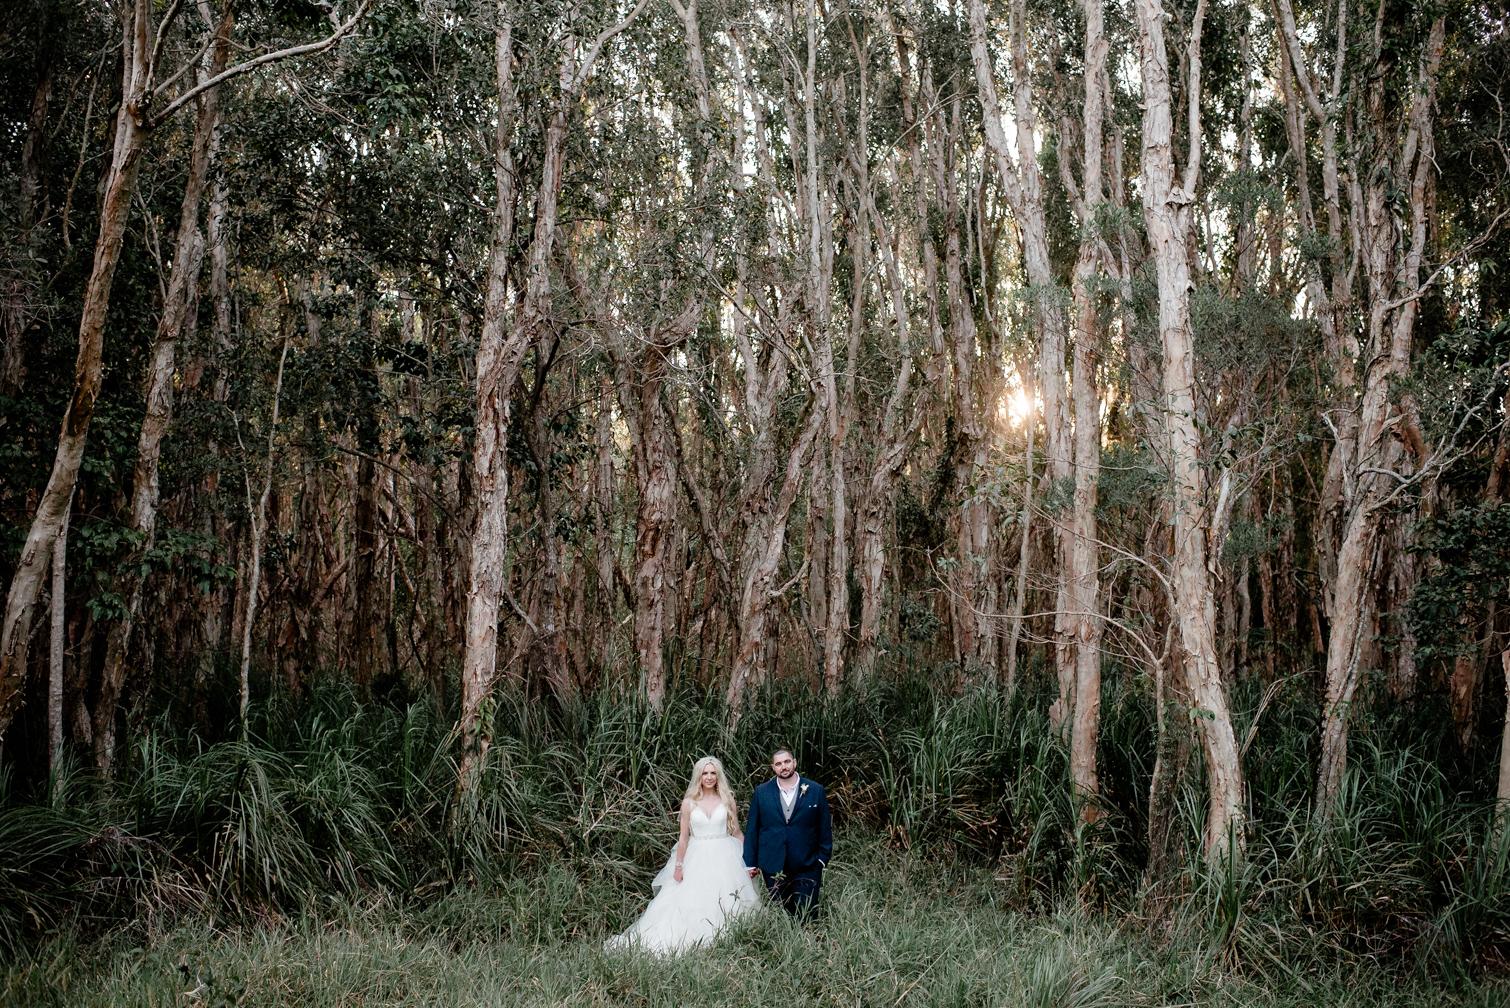 The_Belongil_Byron_Bay_Weddings_New_Black_Studios-137.jpg